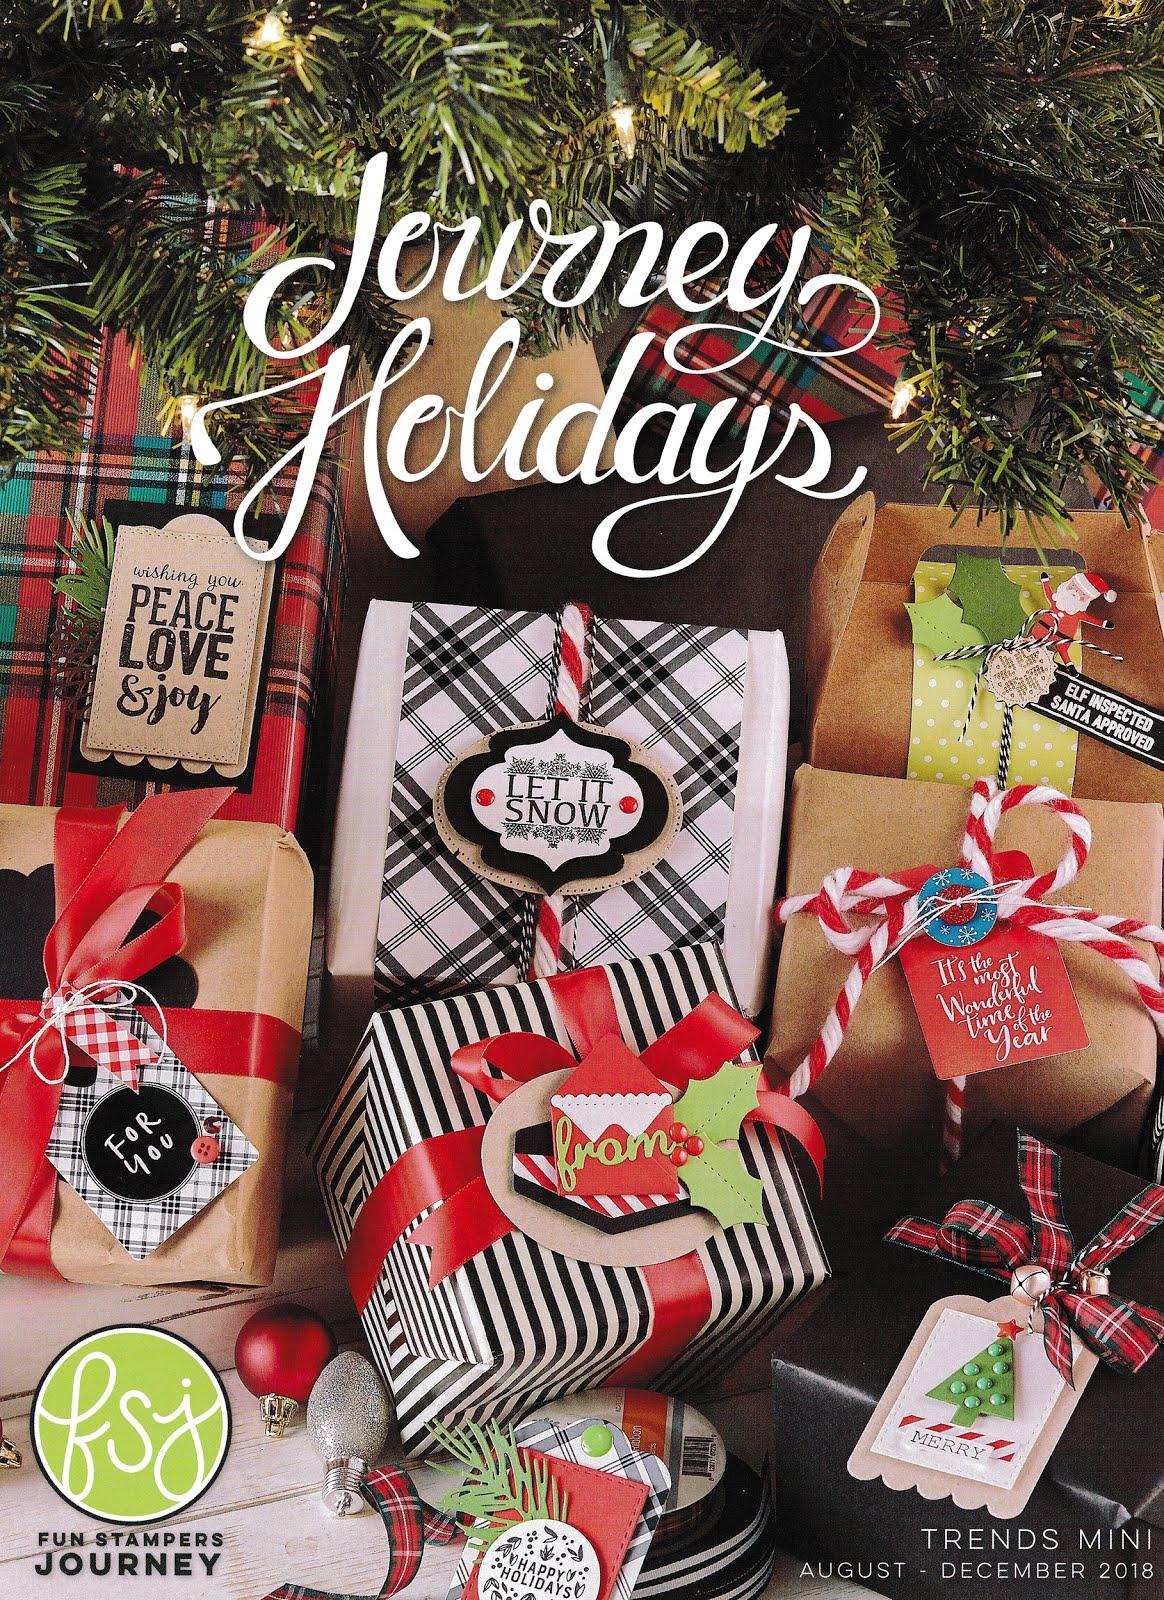 Journey Holiday Mini Catalog, 8/1 - 12/31, 2018